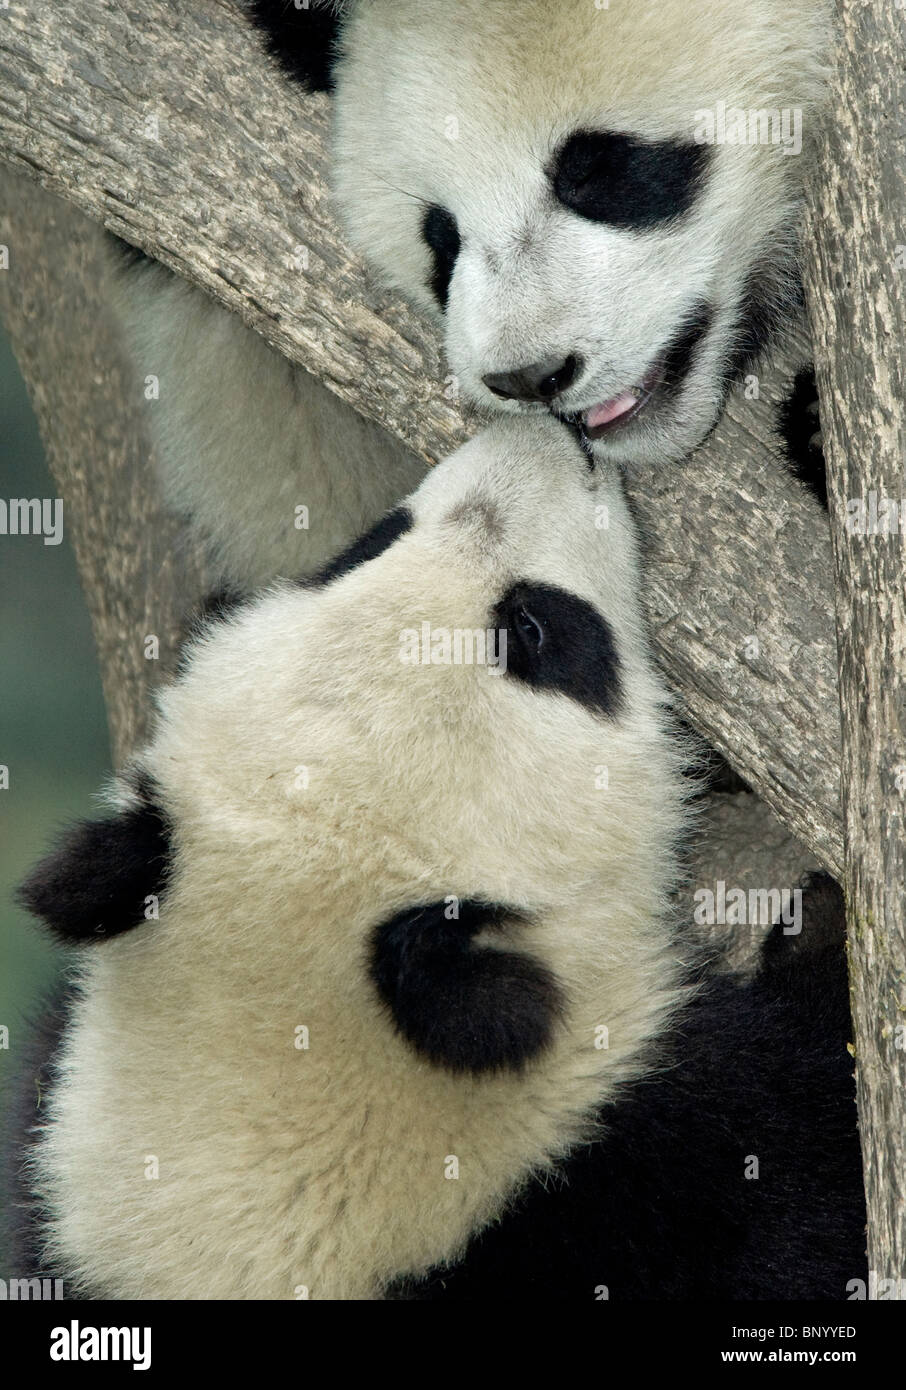 Amable, el panda gigante Ailuropoda melanoleuca, Cubs en Wolong Imagen De Stock